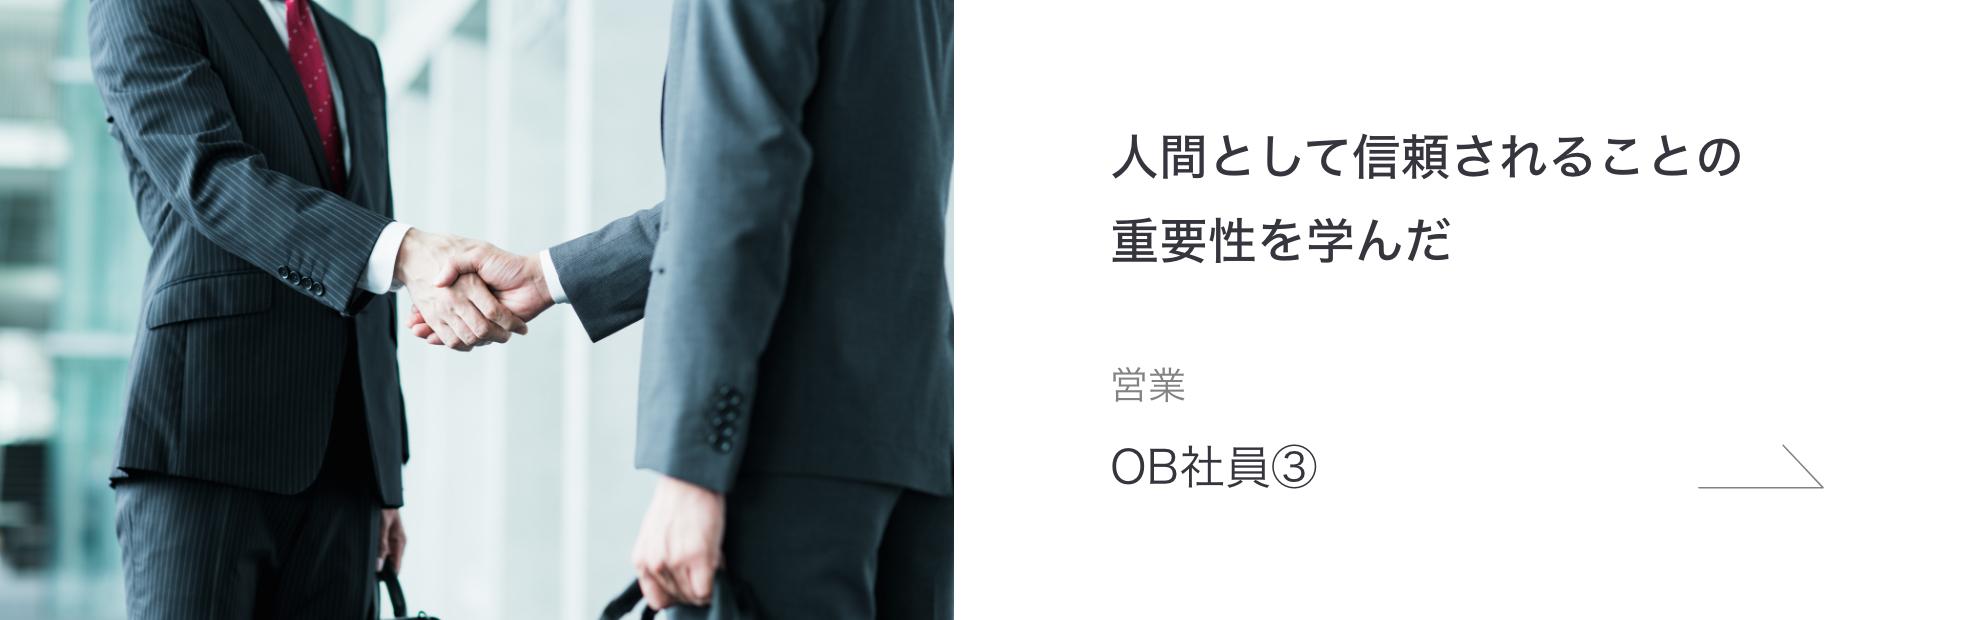 OB社員③